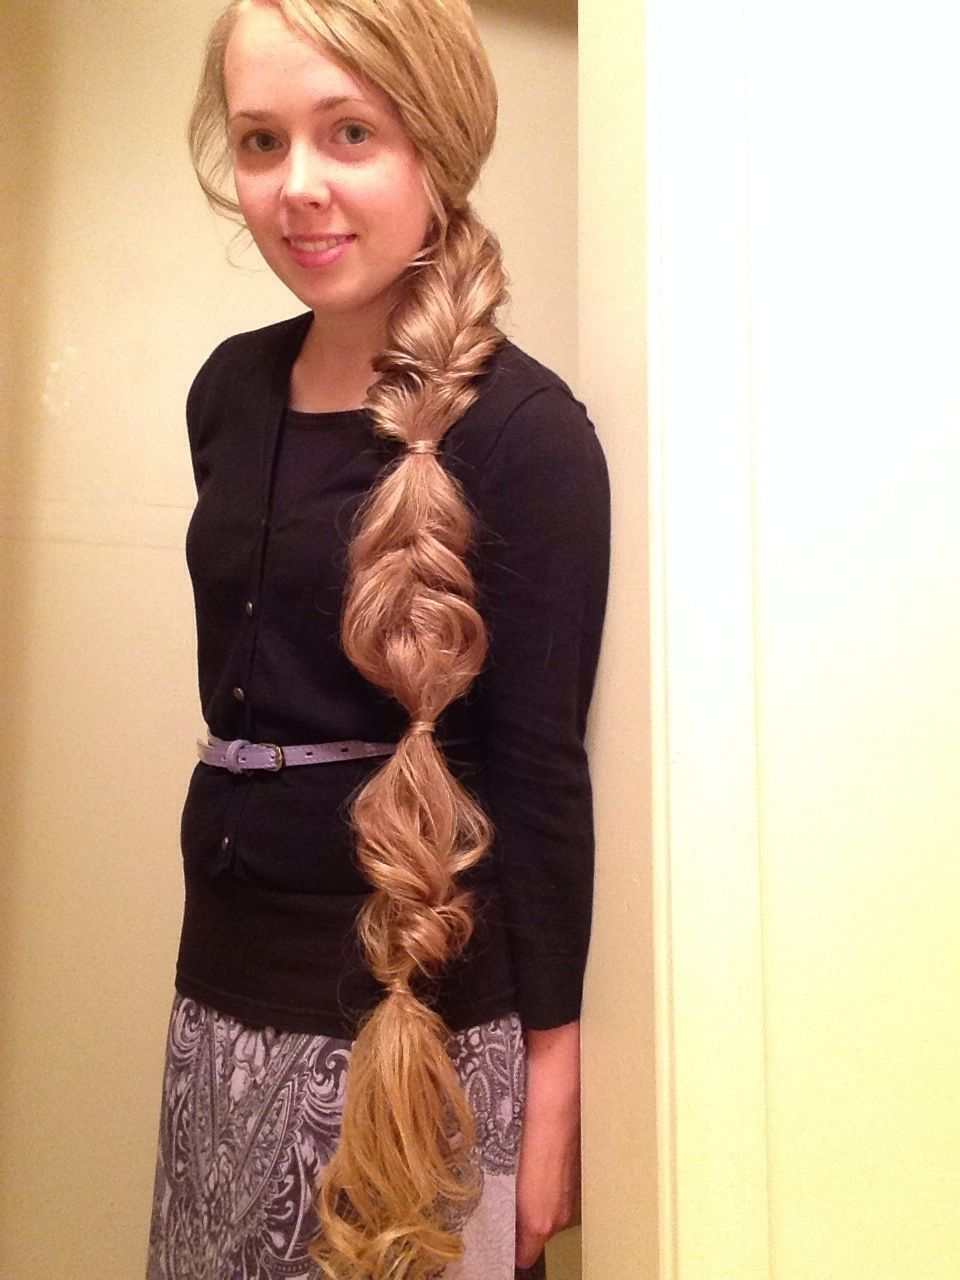 Pin By Vgirl333 On Updos Pentecostal Hairstyles Long Hair Styles Elegant Hairstyles